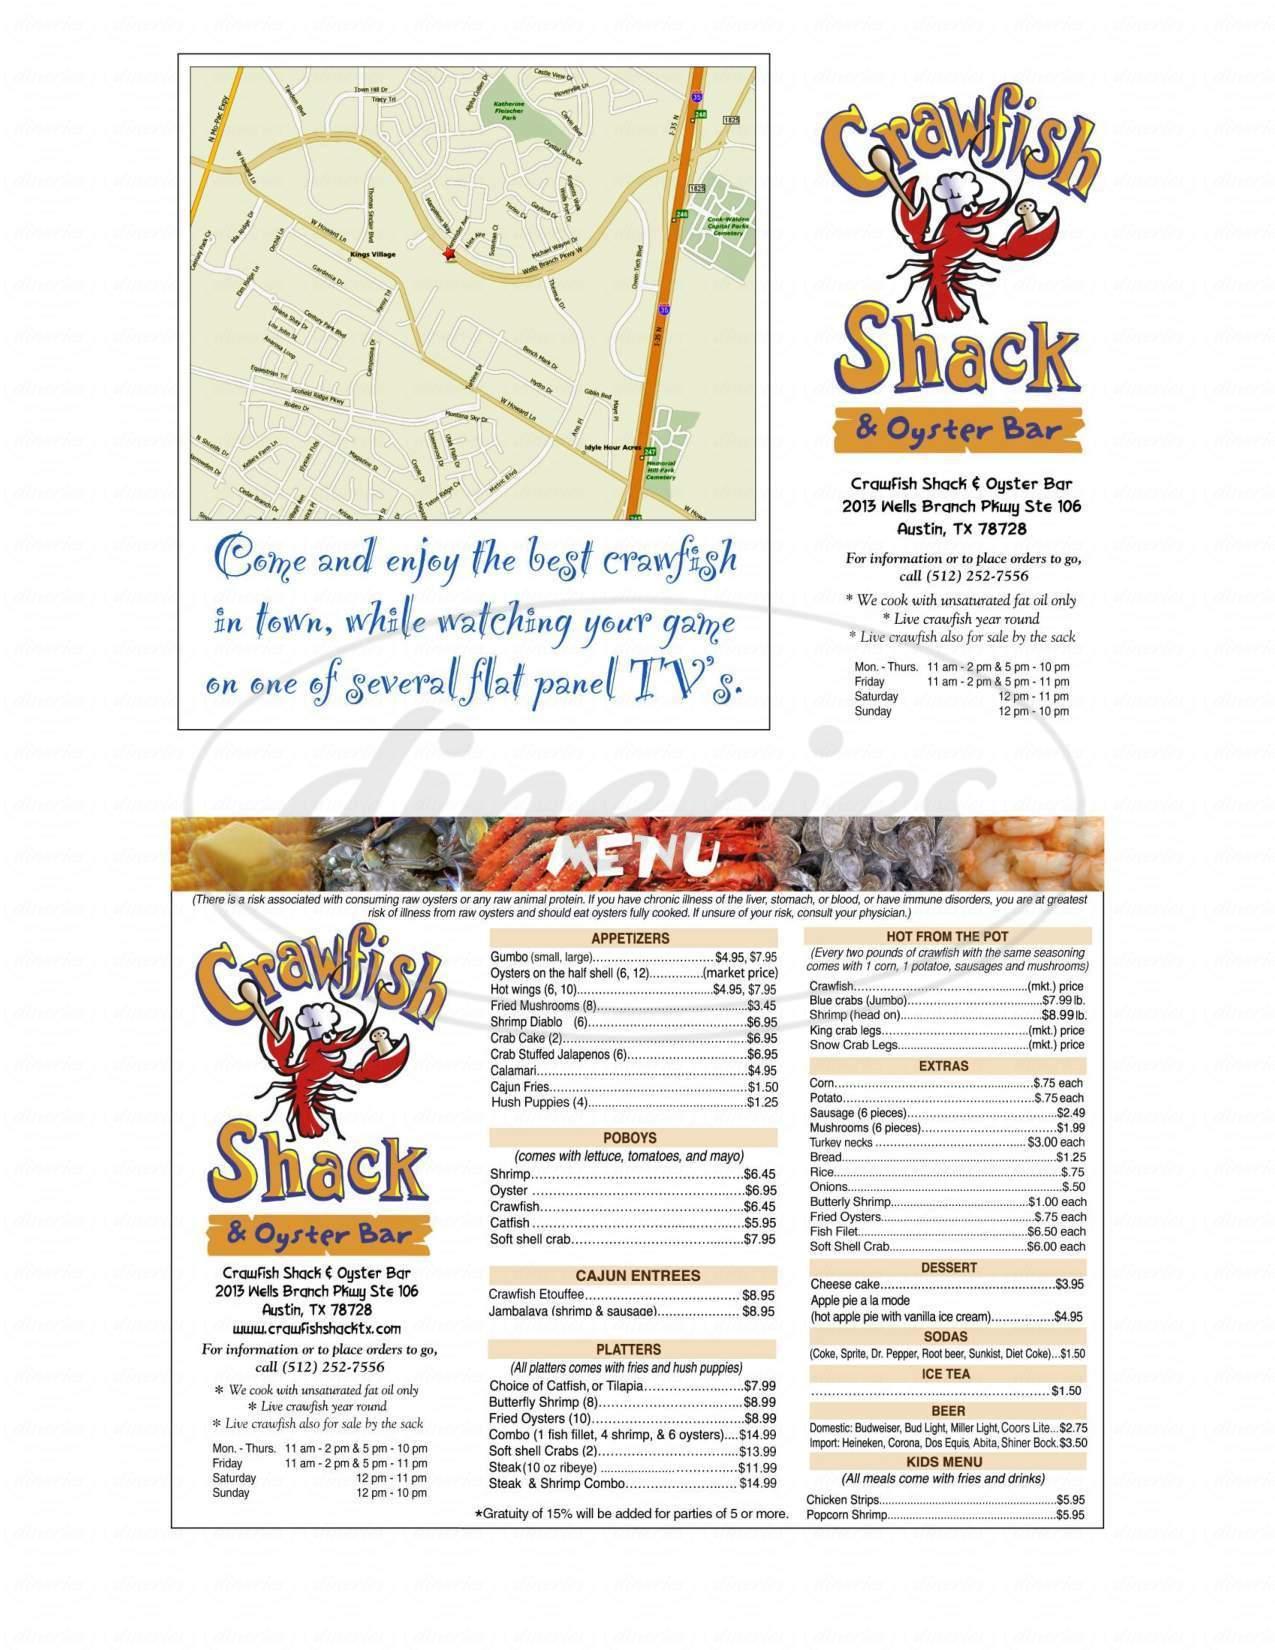 menu for Crawfish Shack & Oyster Bar